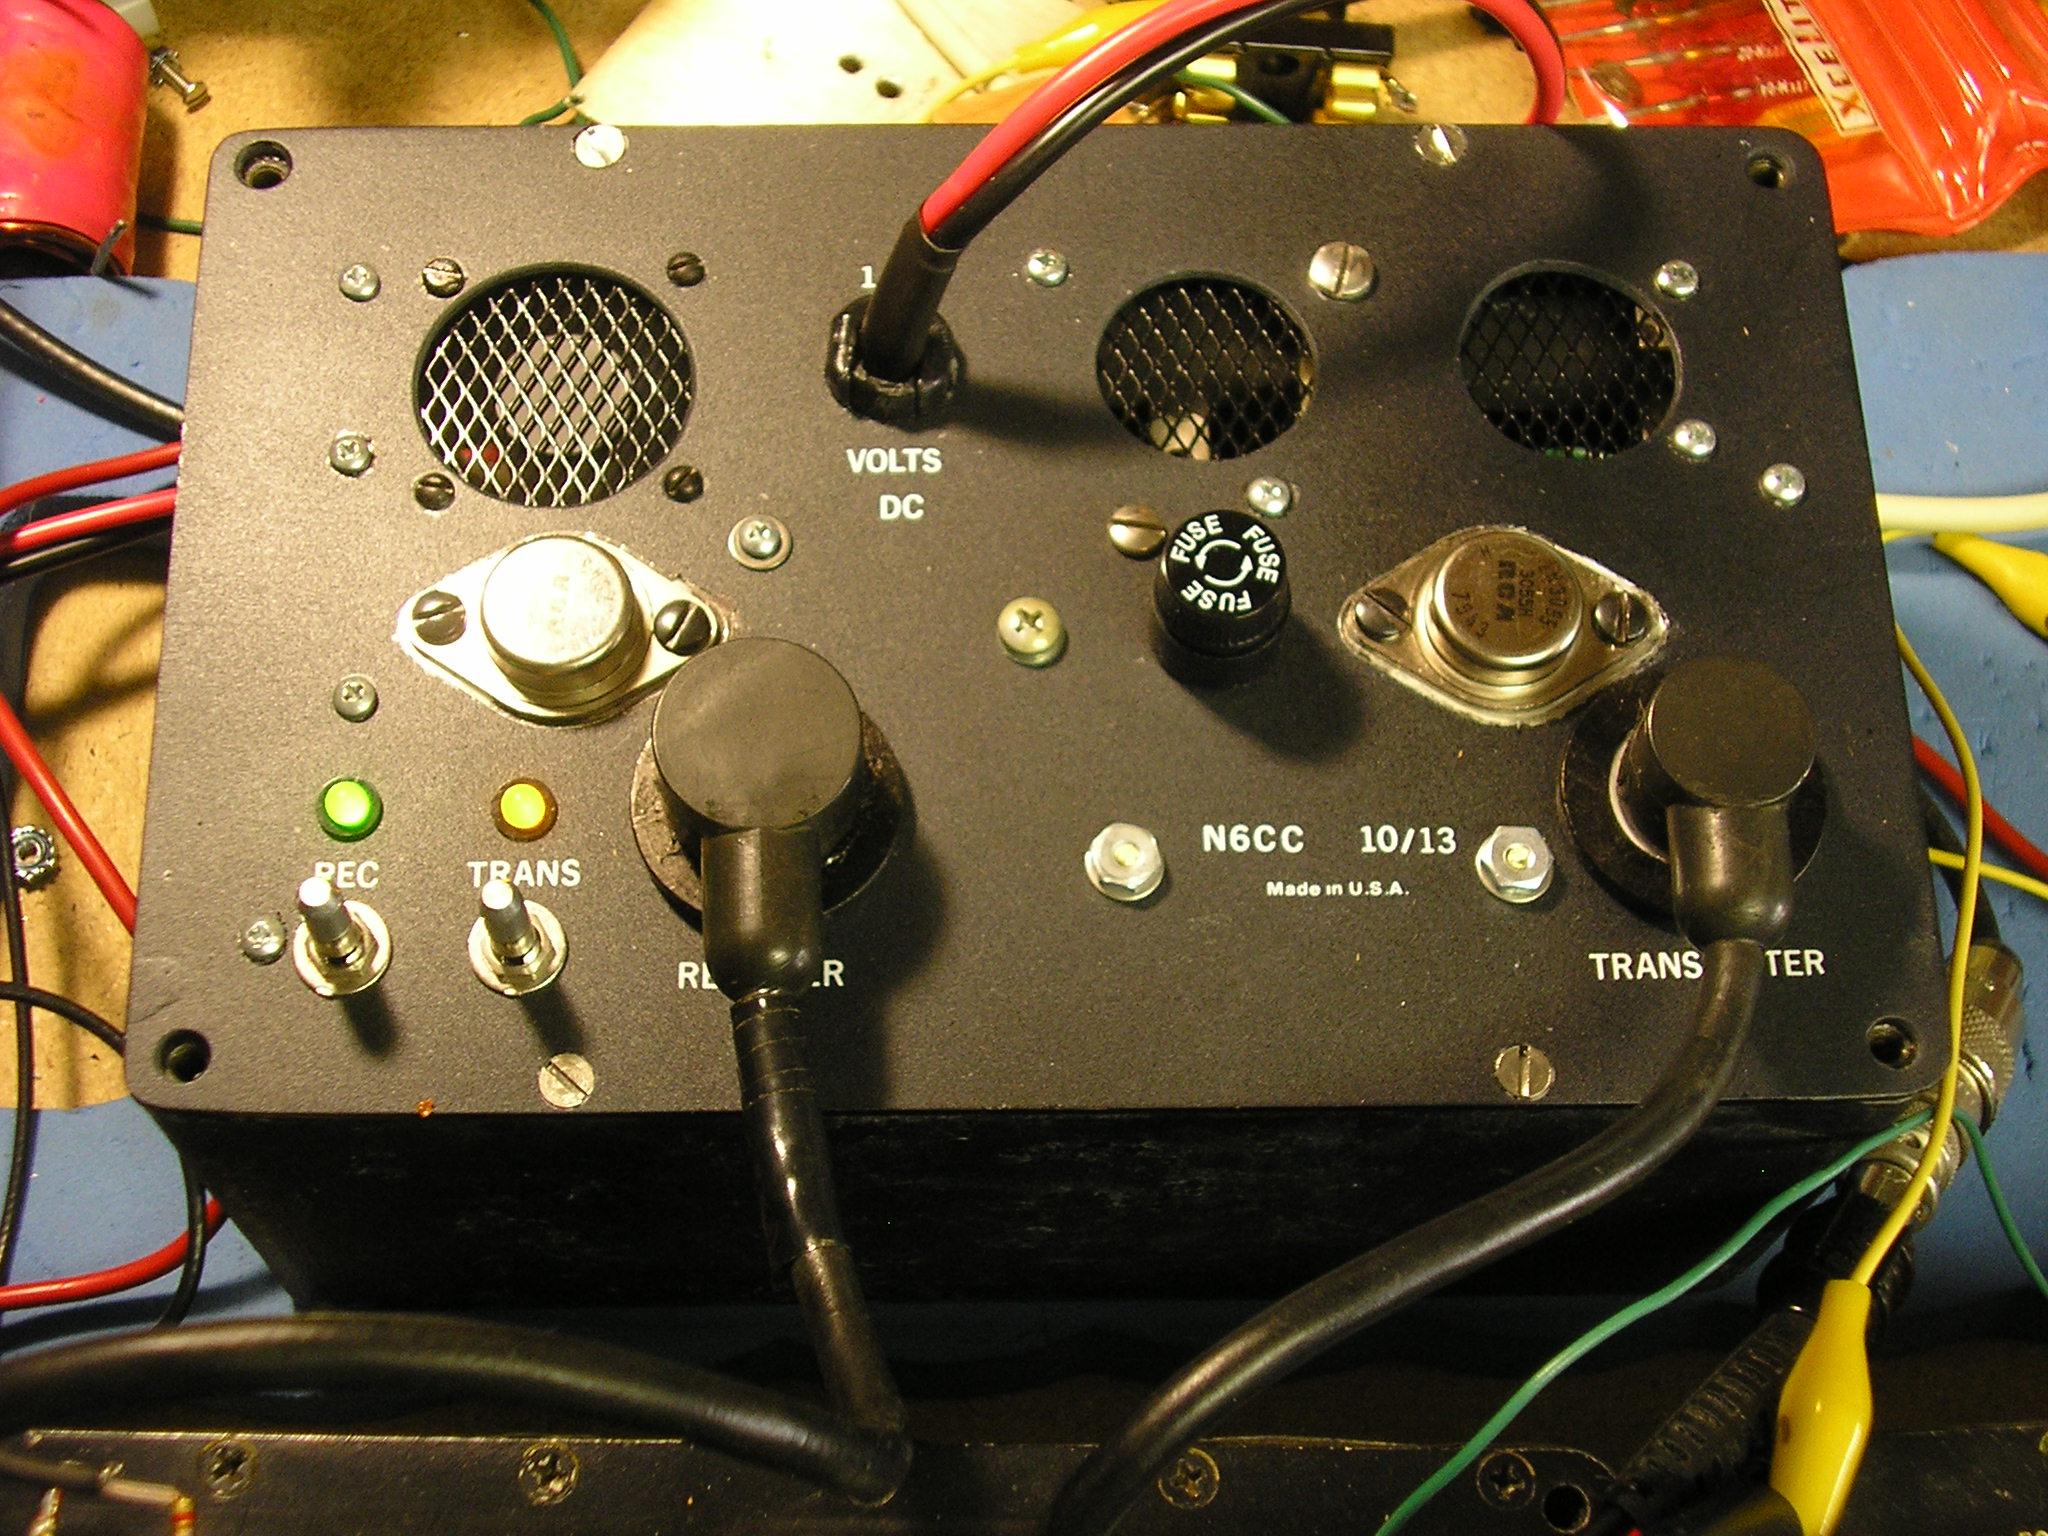 GRC-109 12 VDC Power Supply - N6CC